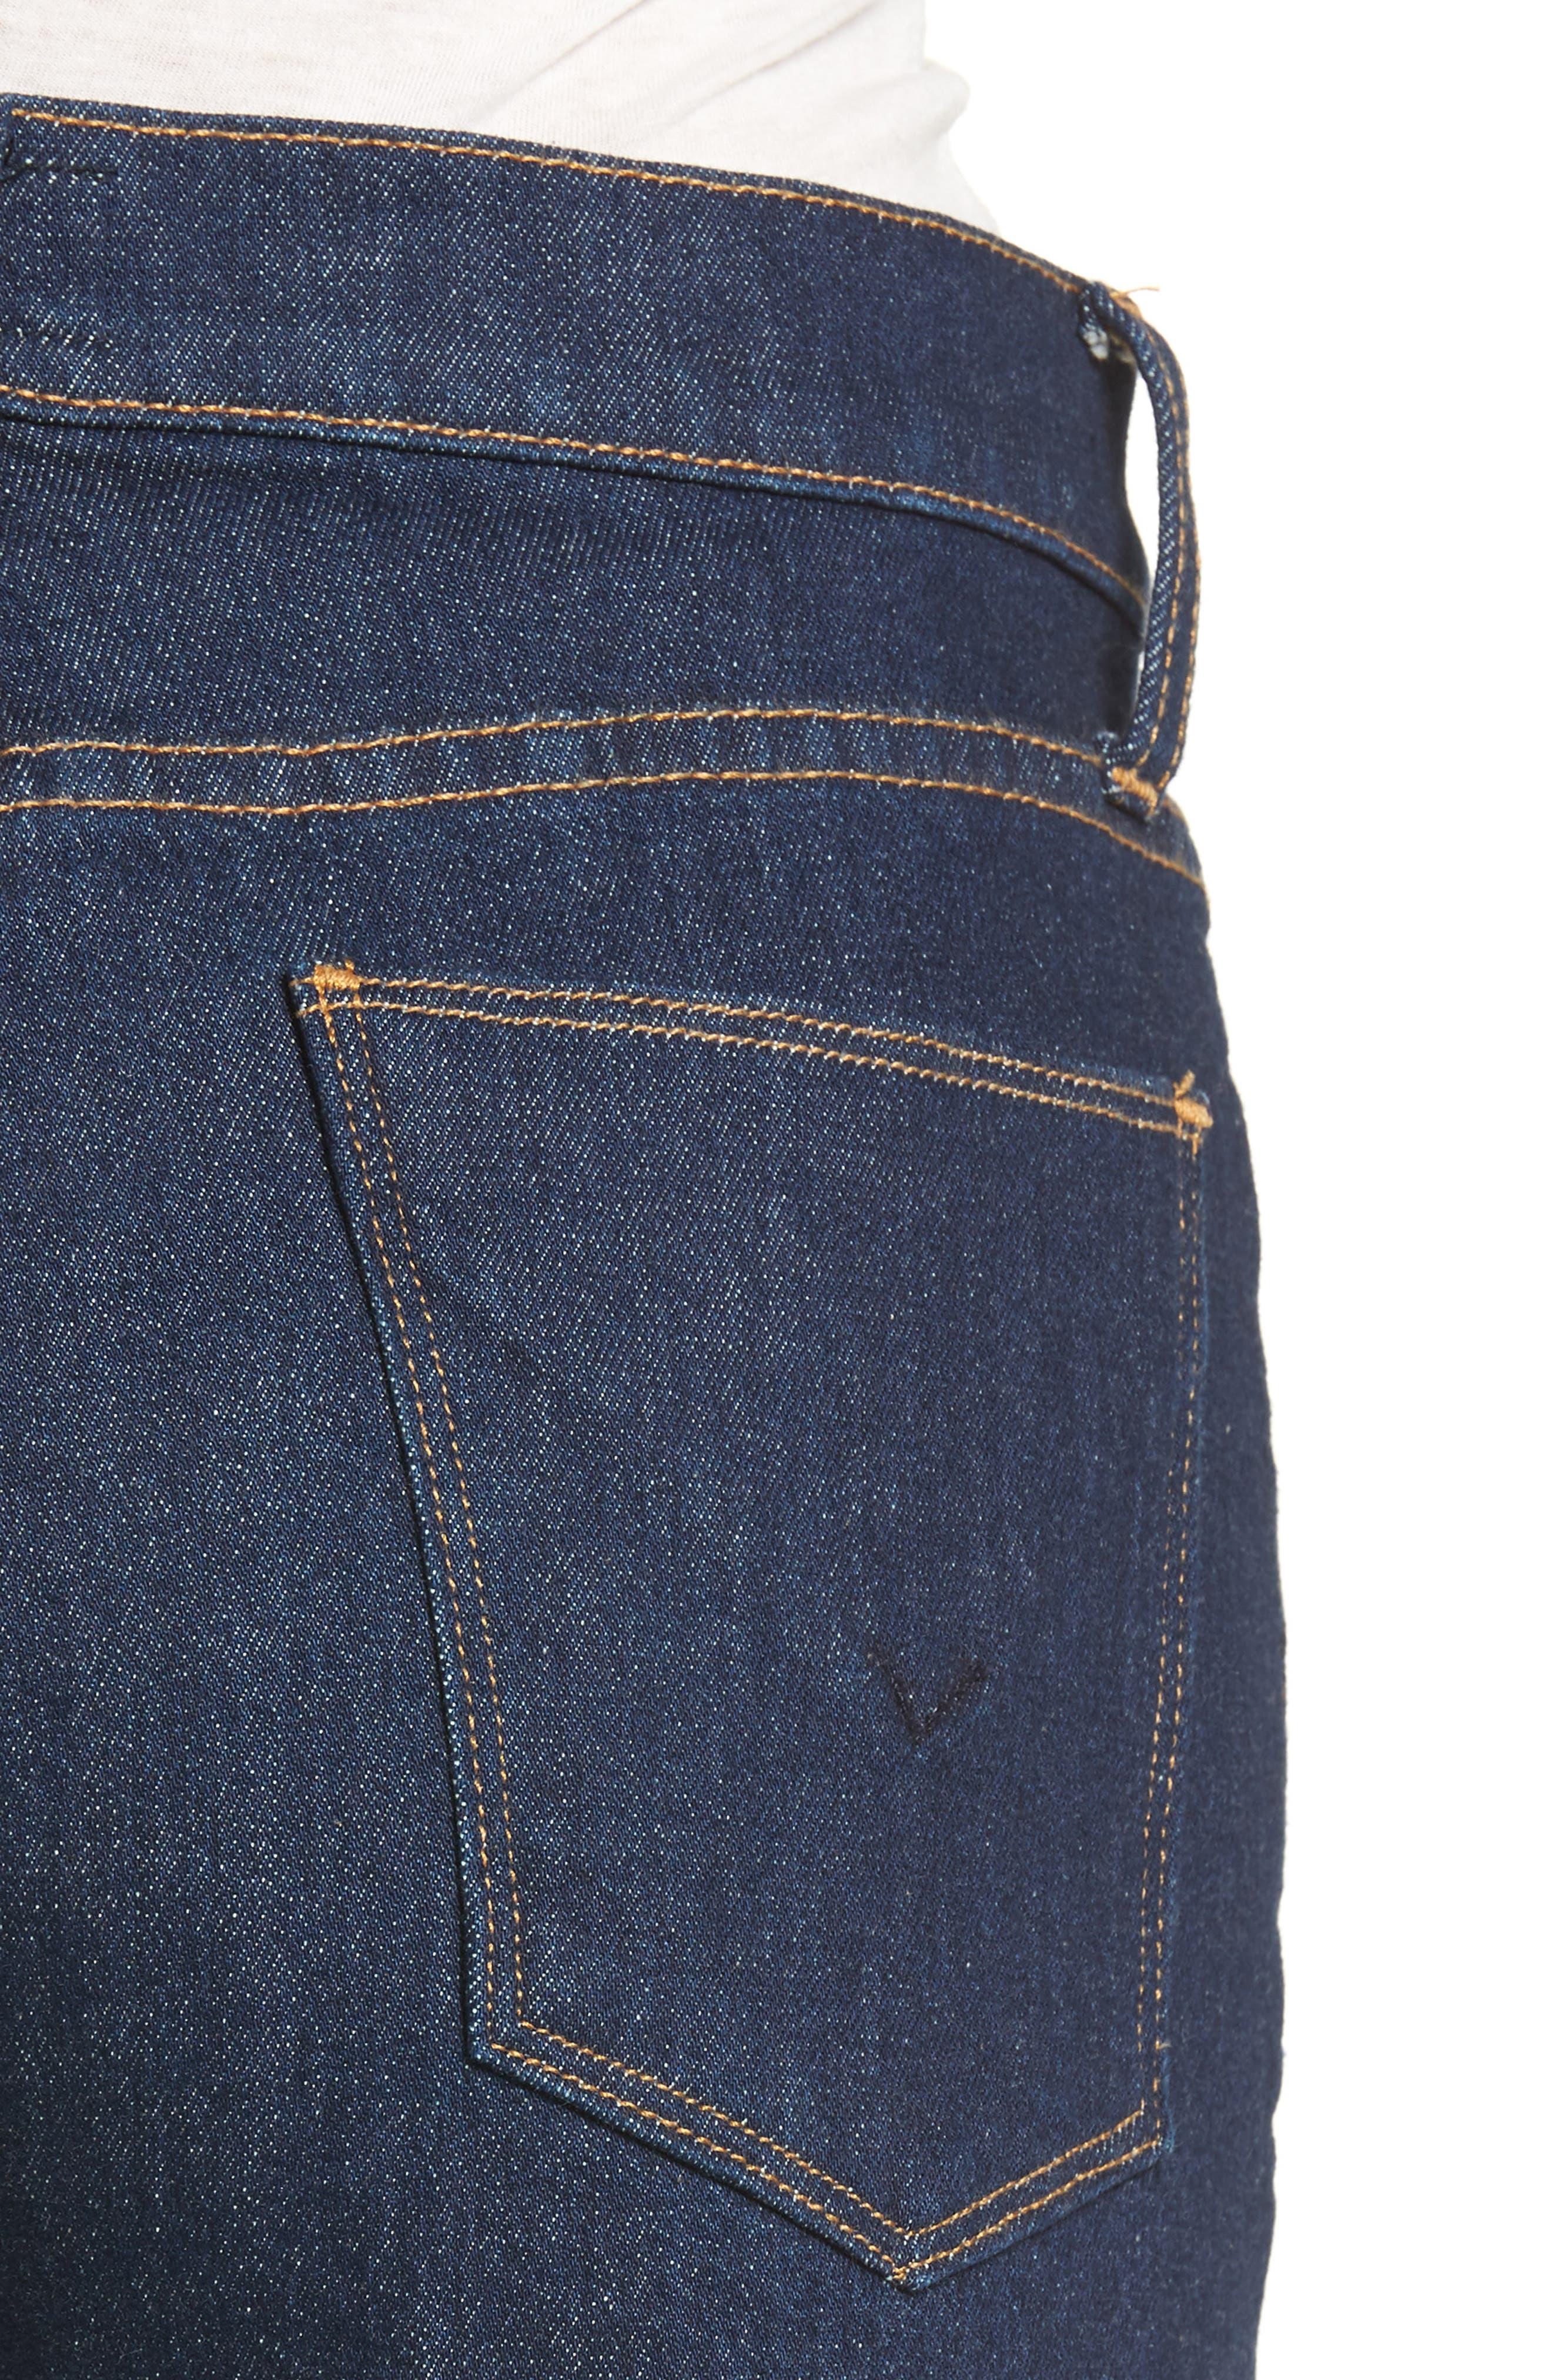 Zoeey High Waist Crop Straight Leg Jeans,                             Alternate thumbnail 11, color,